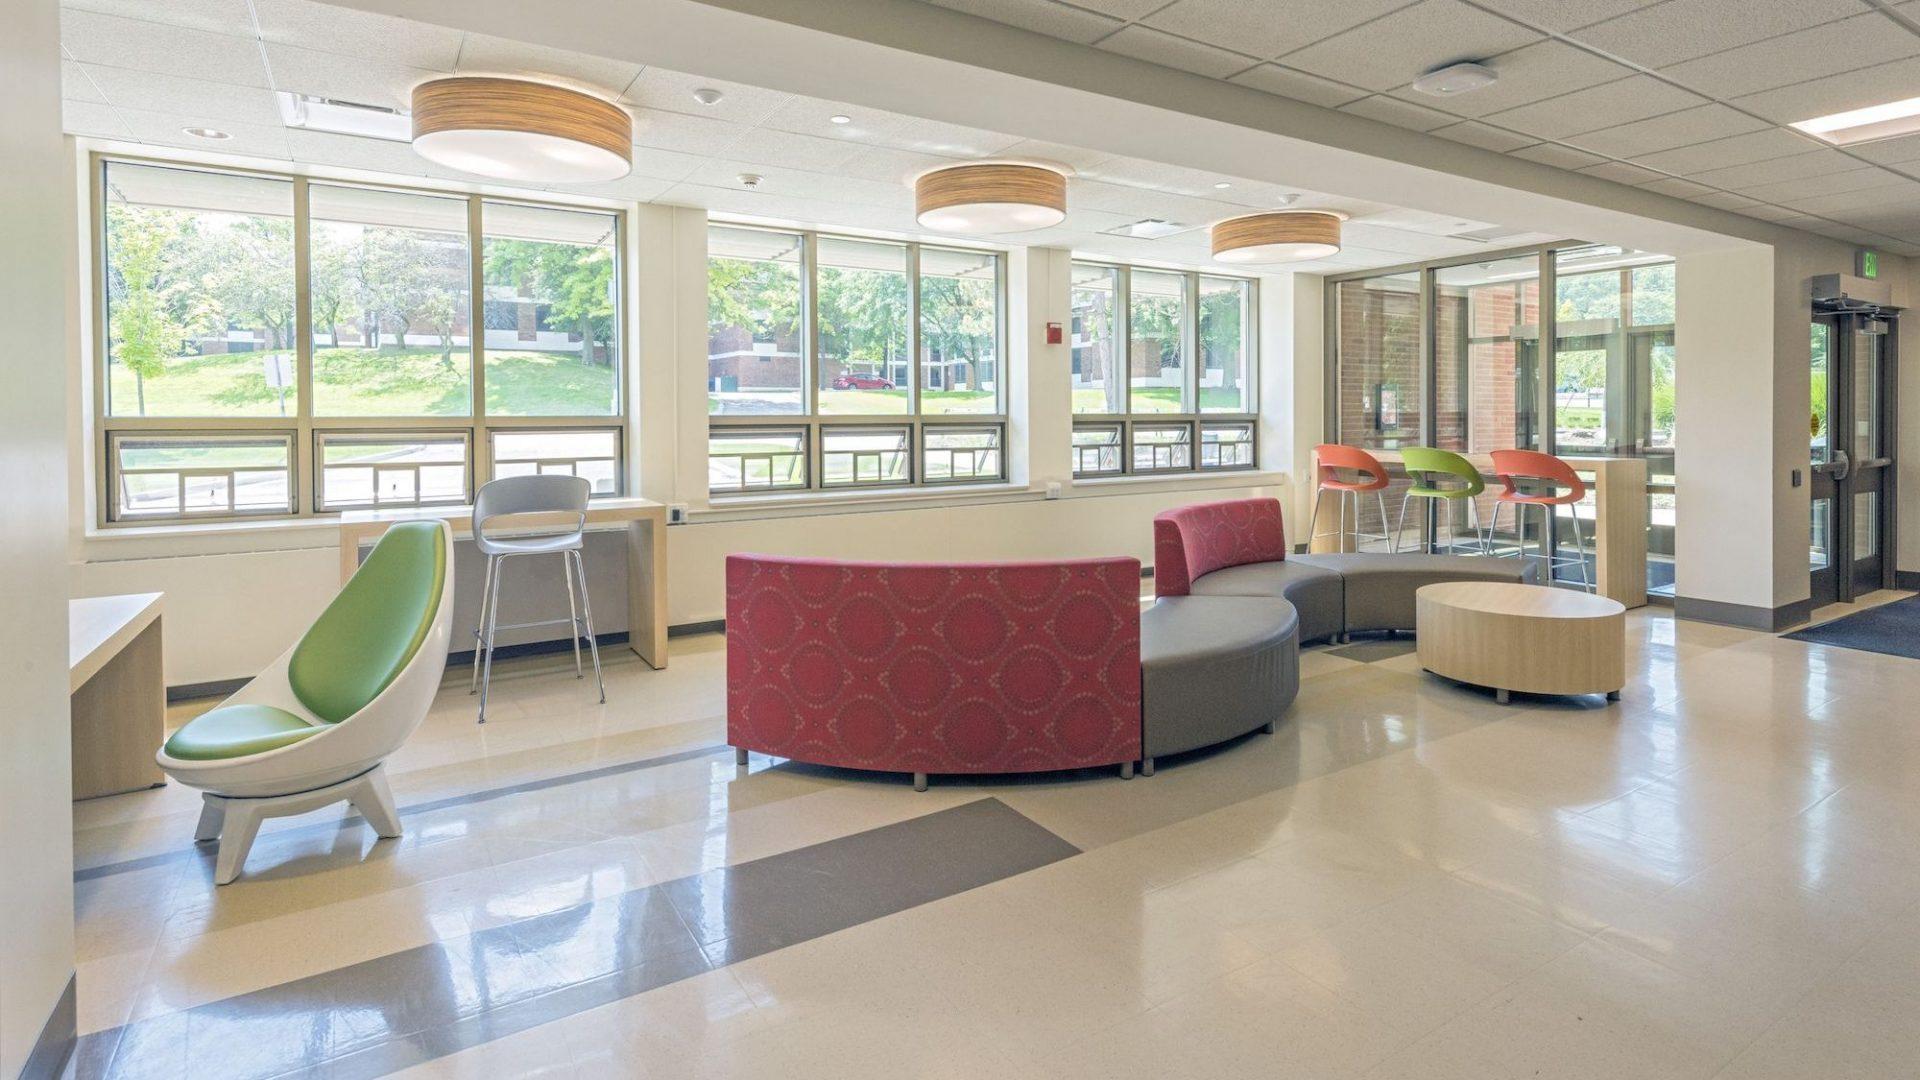 Binghamton Student Wing Interior 1